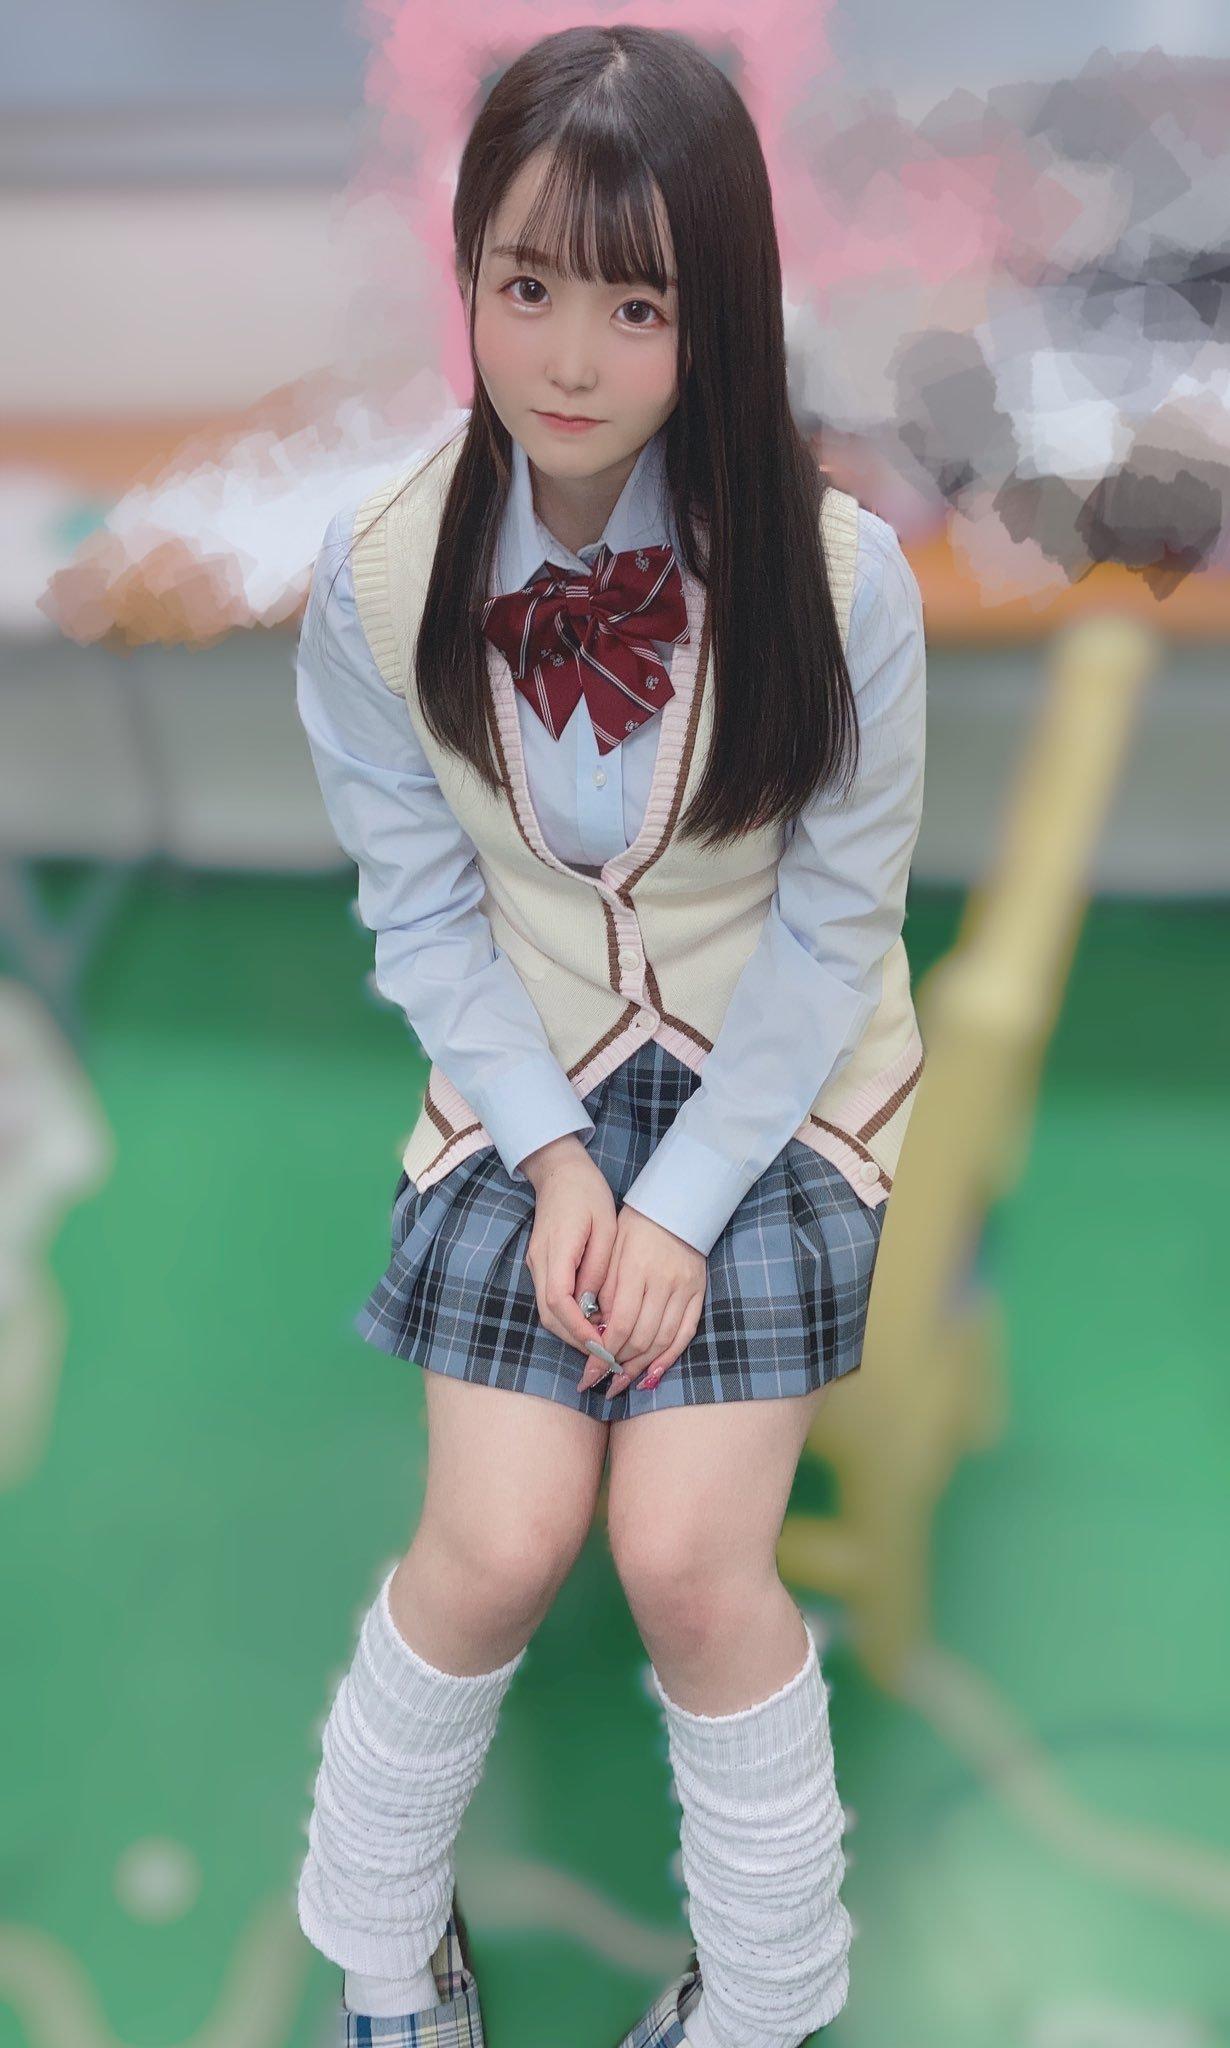 CAWD-219阿波踊的舞者绀野みいな(绀野美衣奈)战斗条件确实非常好 (7)